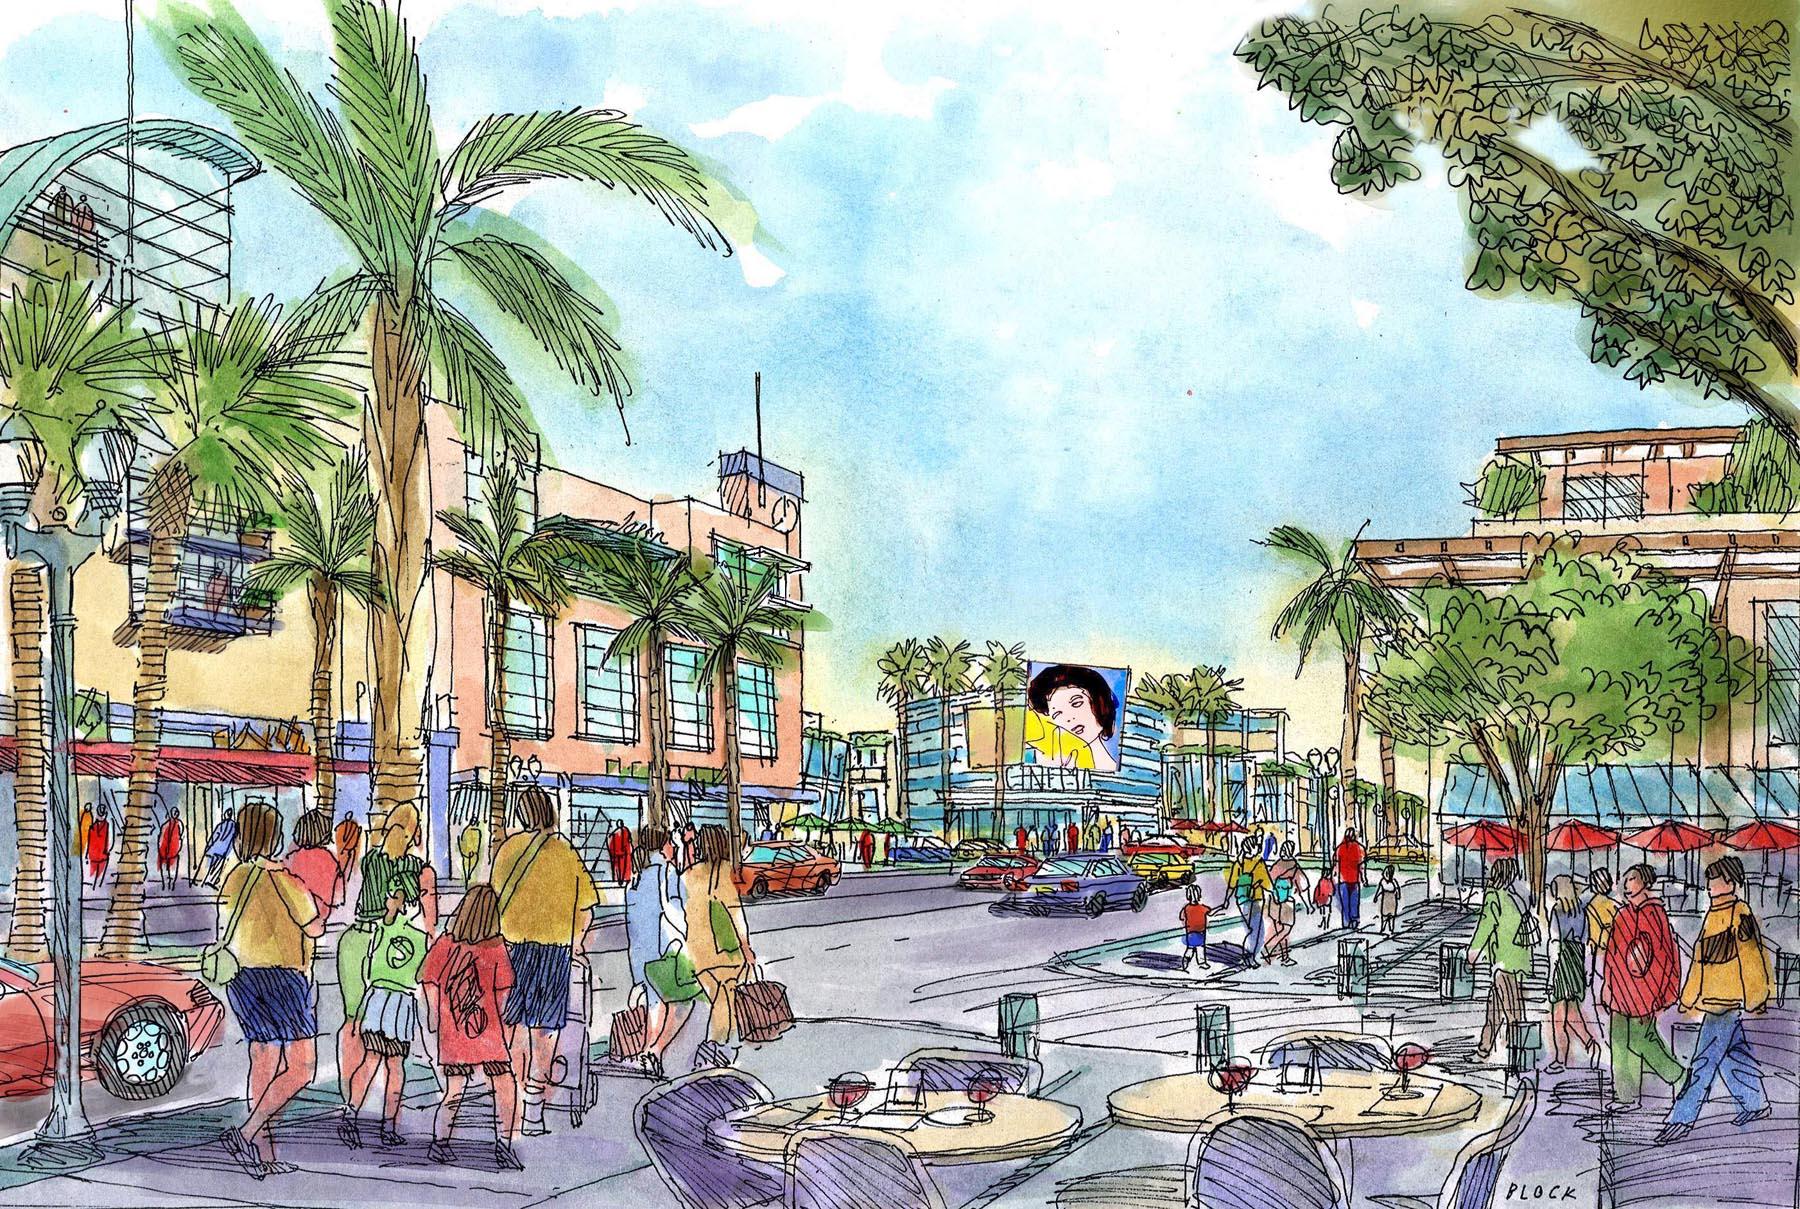 Downtown Monterey Park Mixed Use & Pedestrian Linkages Plan